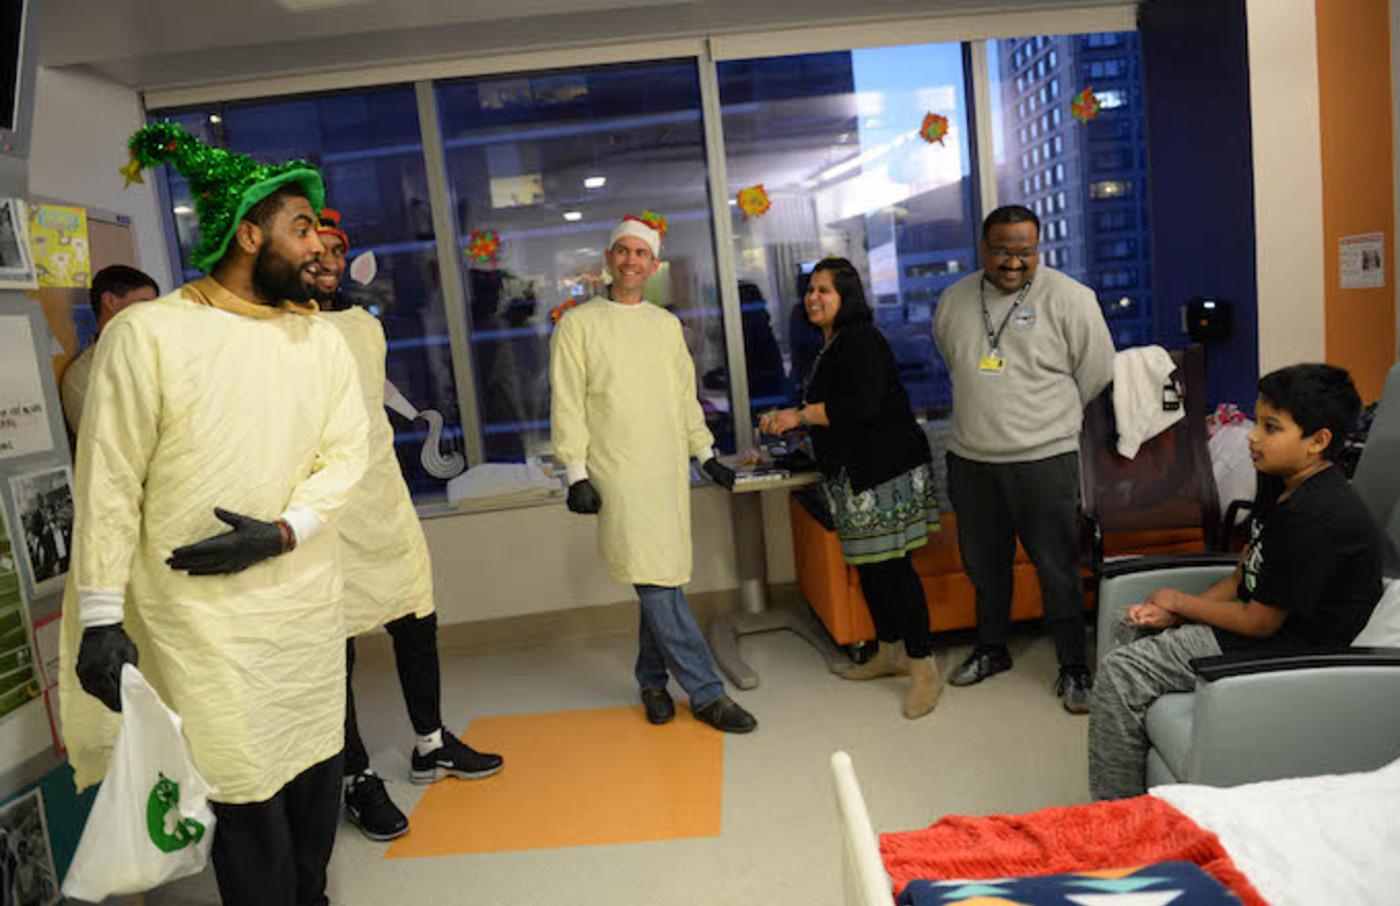 Kyrie Irving debates patient at Boston Children's Hospital